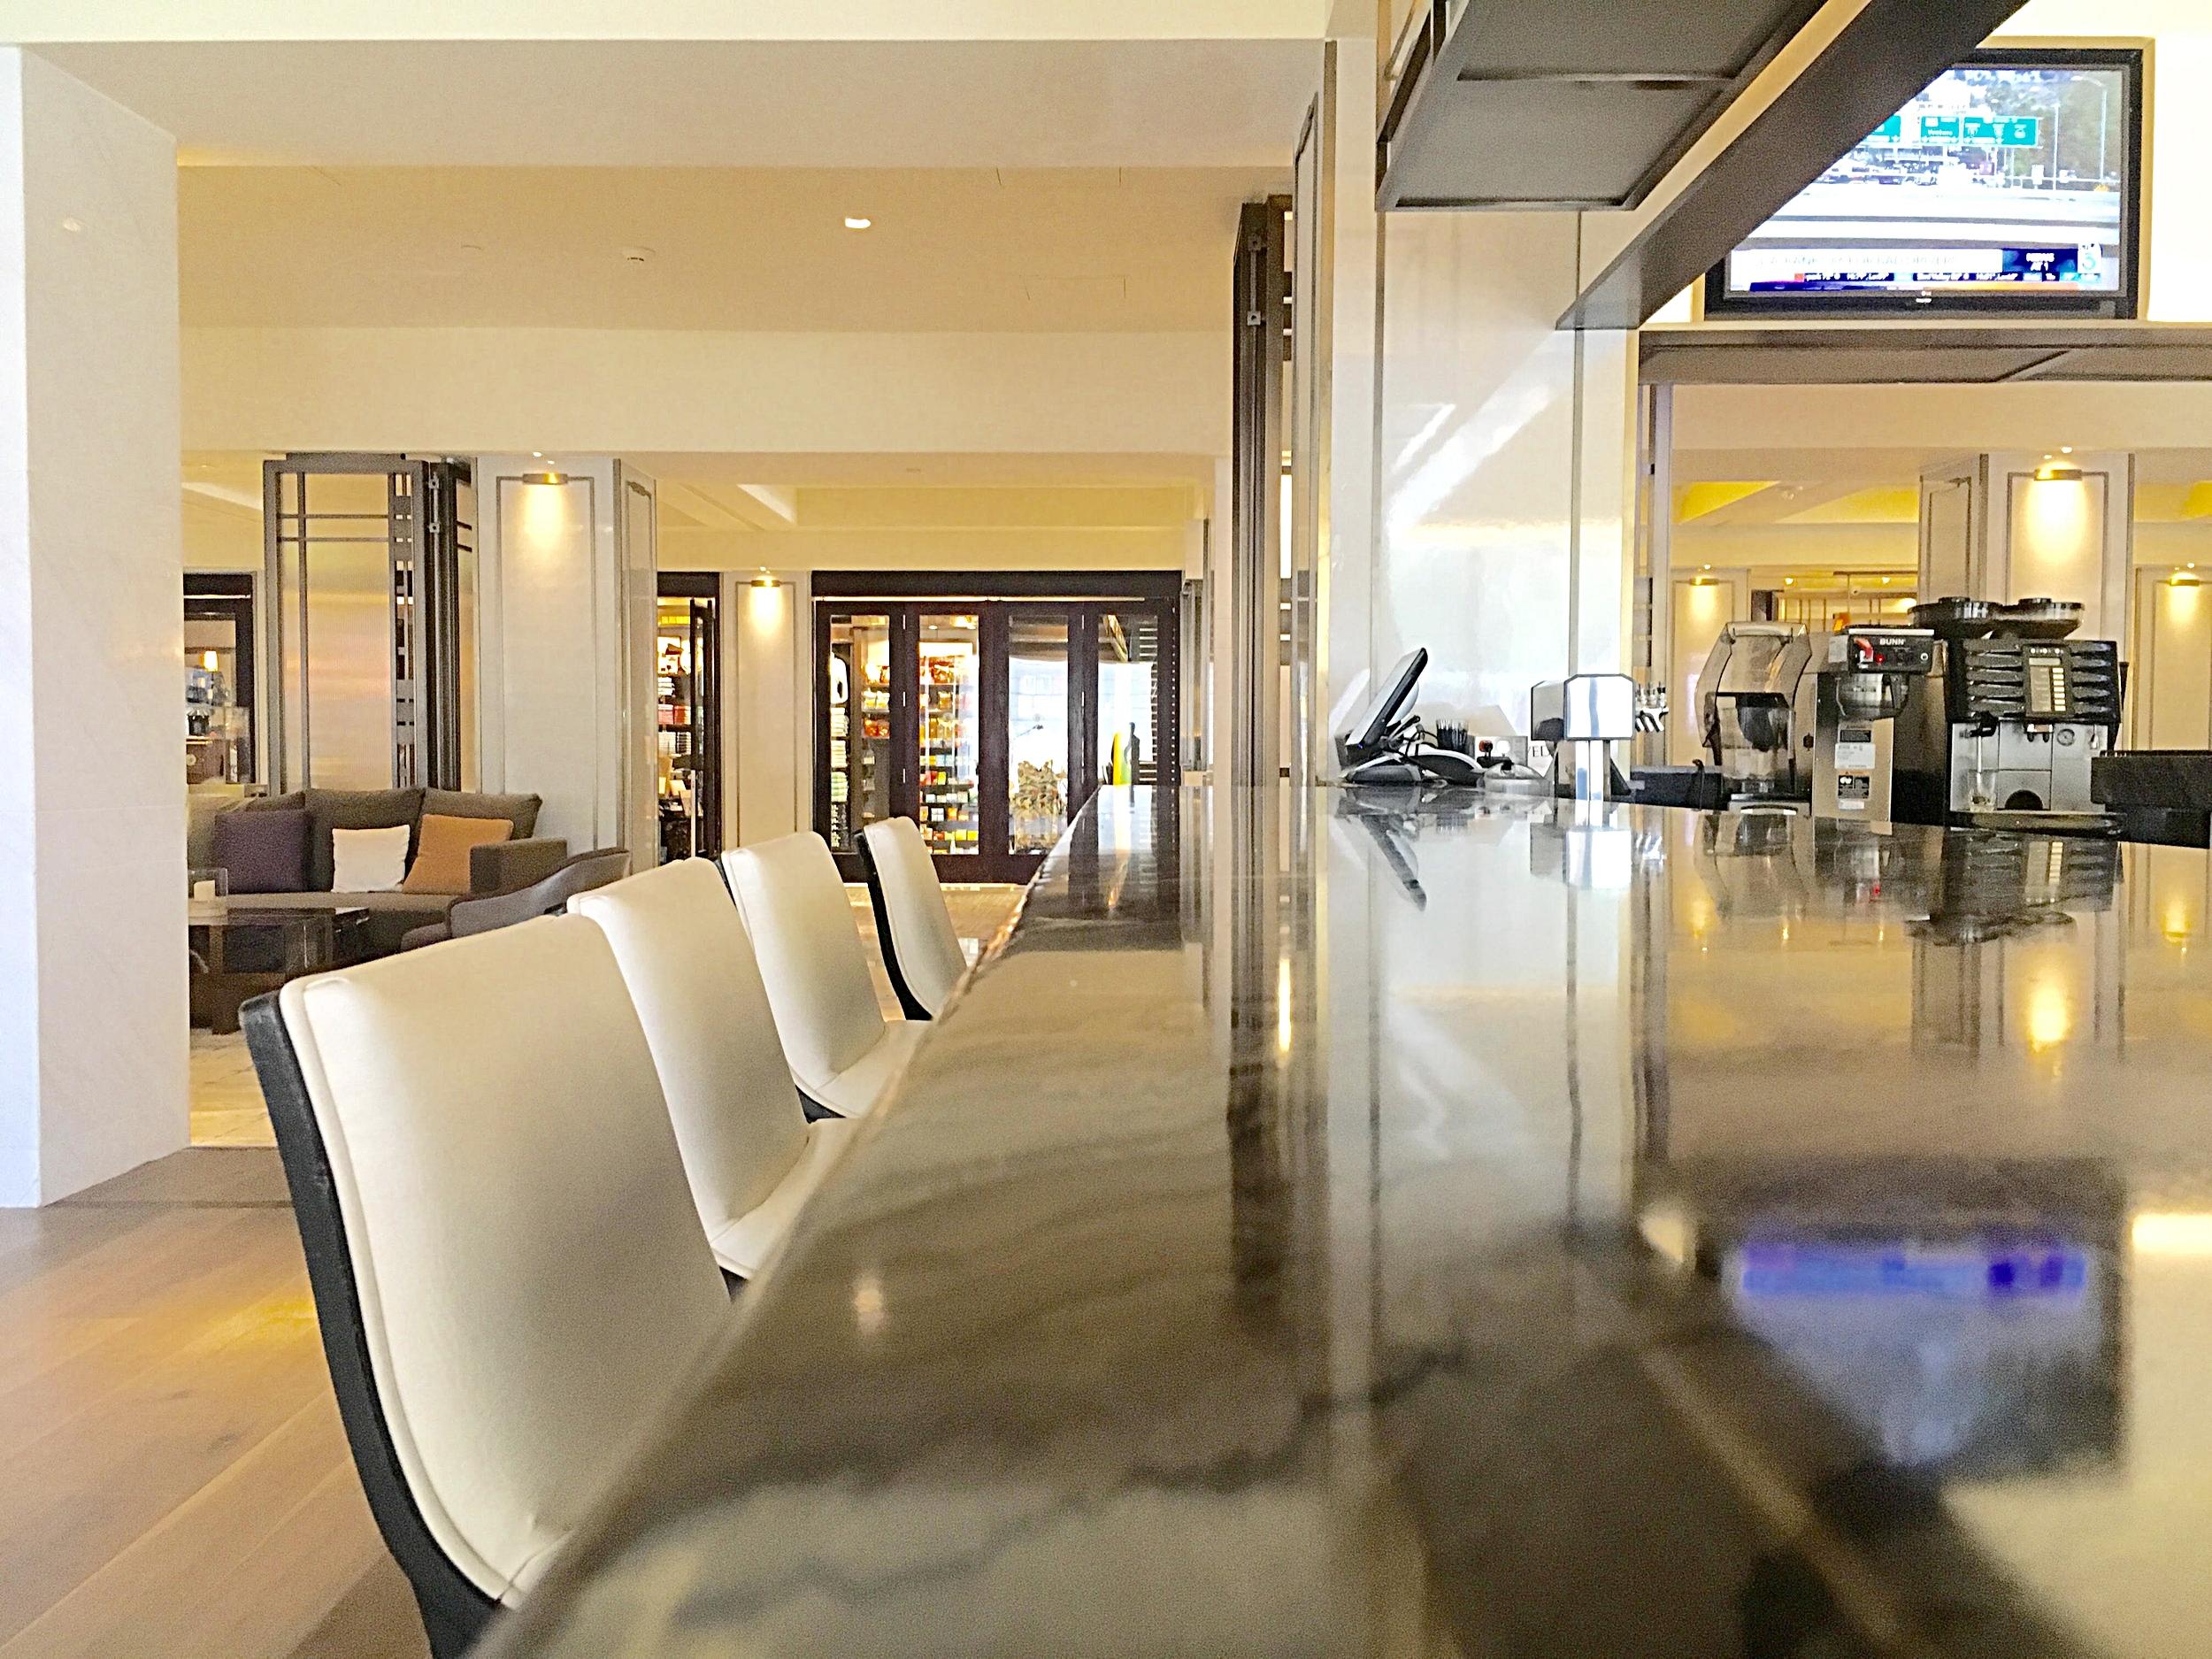 New Mix Bar, located in lobby @SheratonUniversal